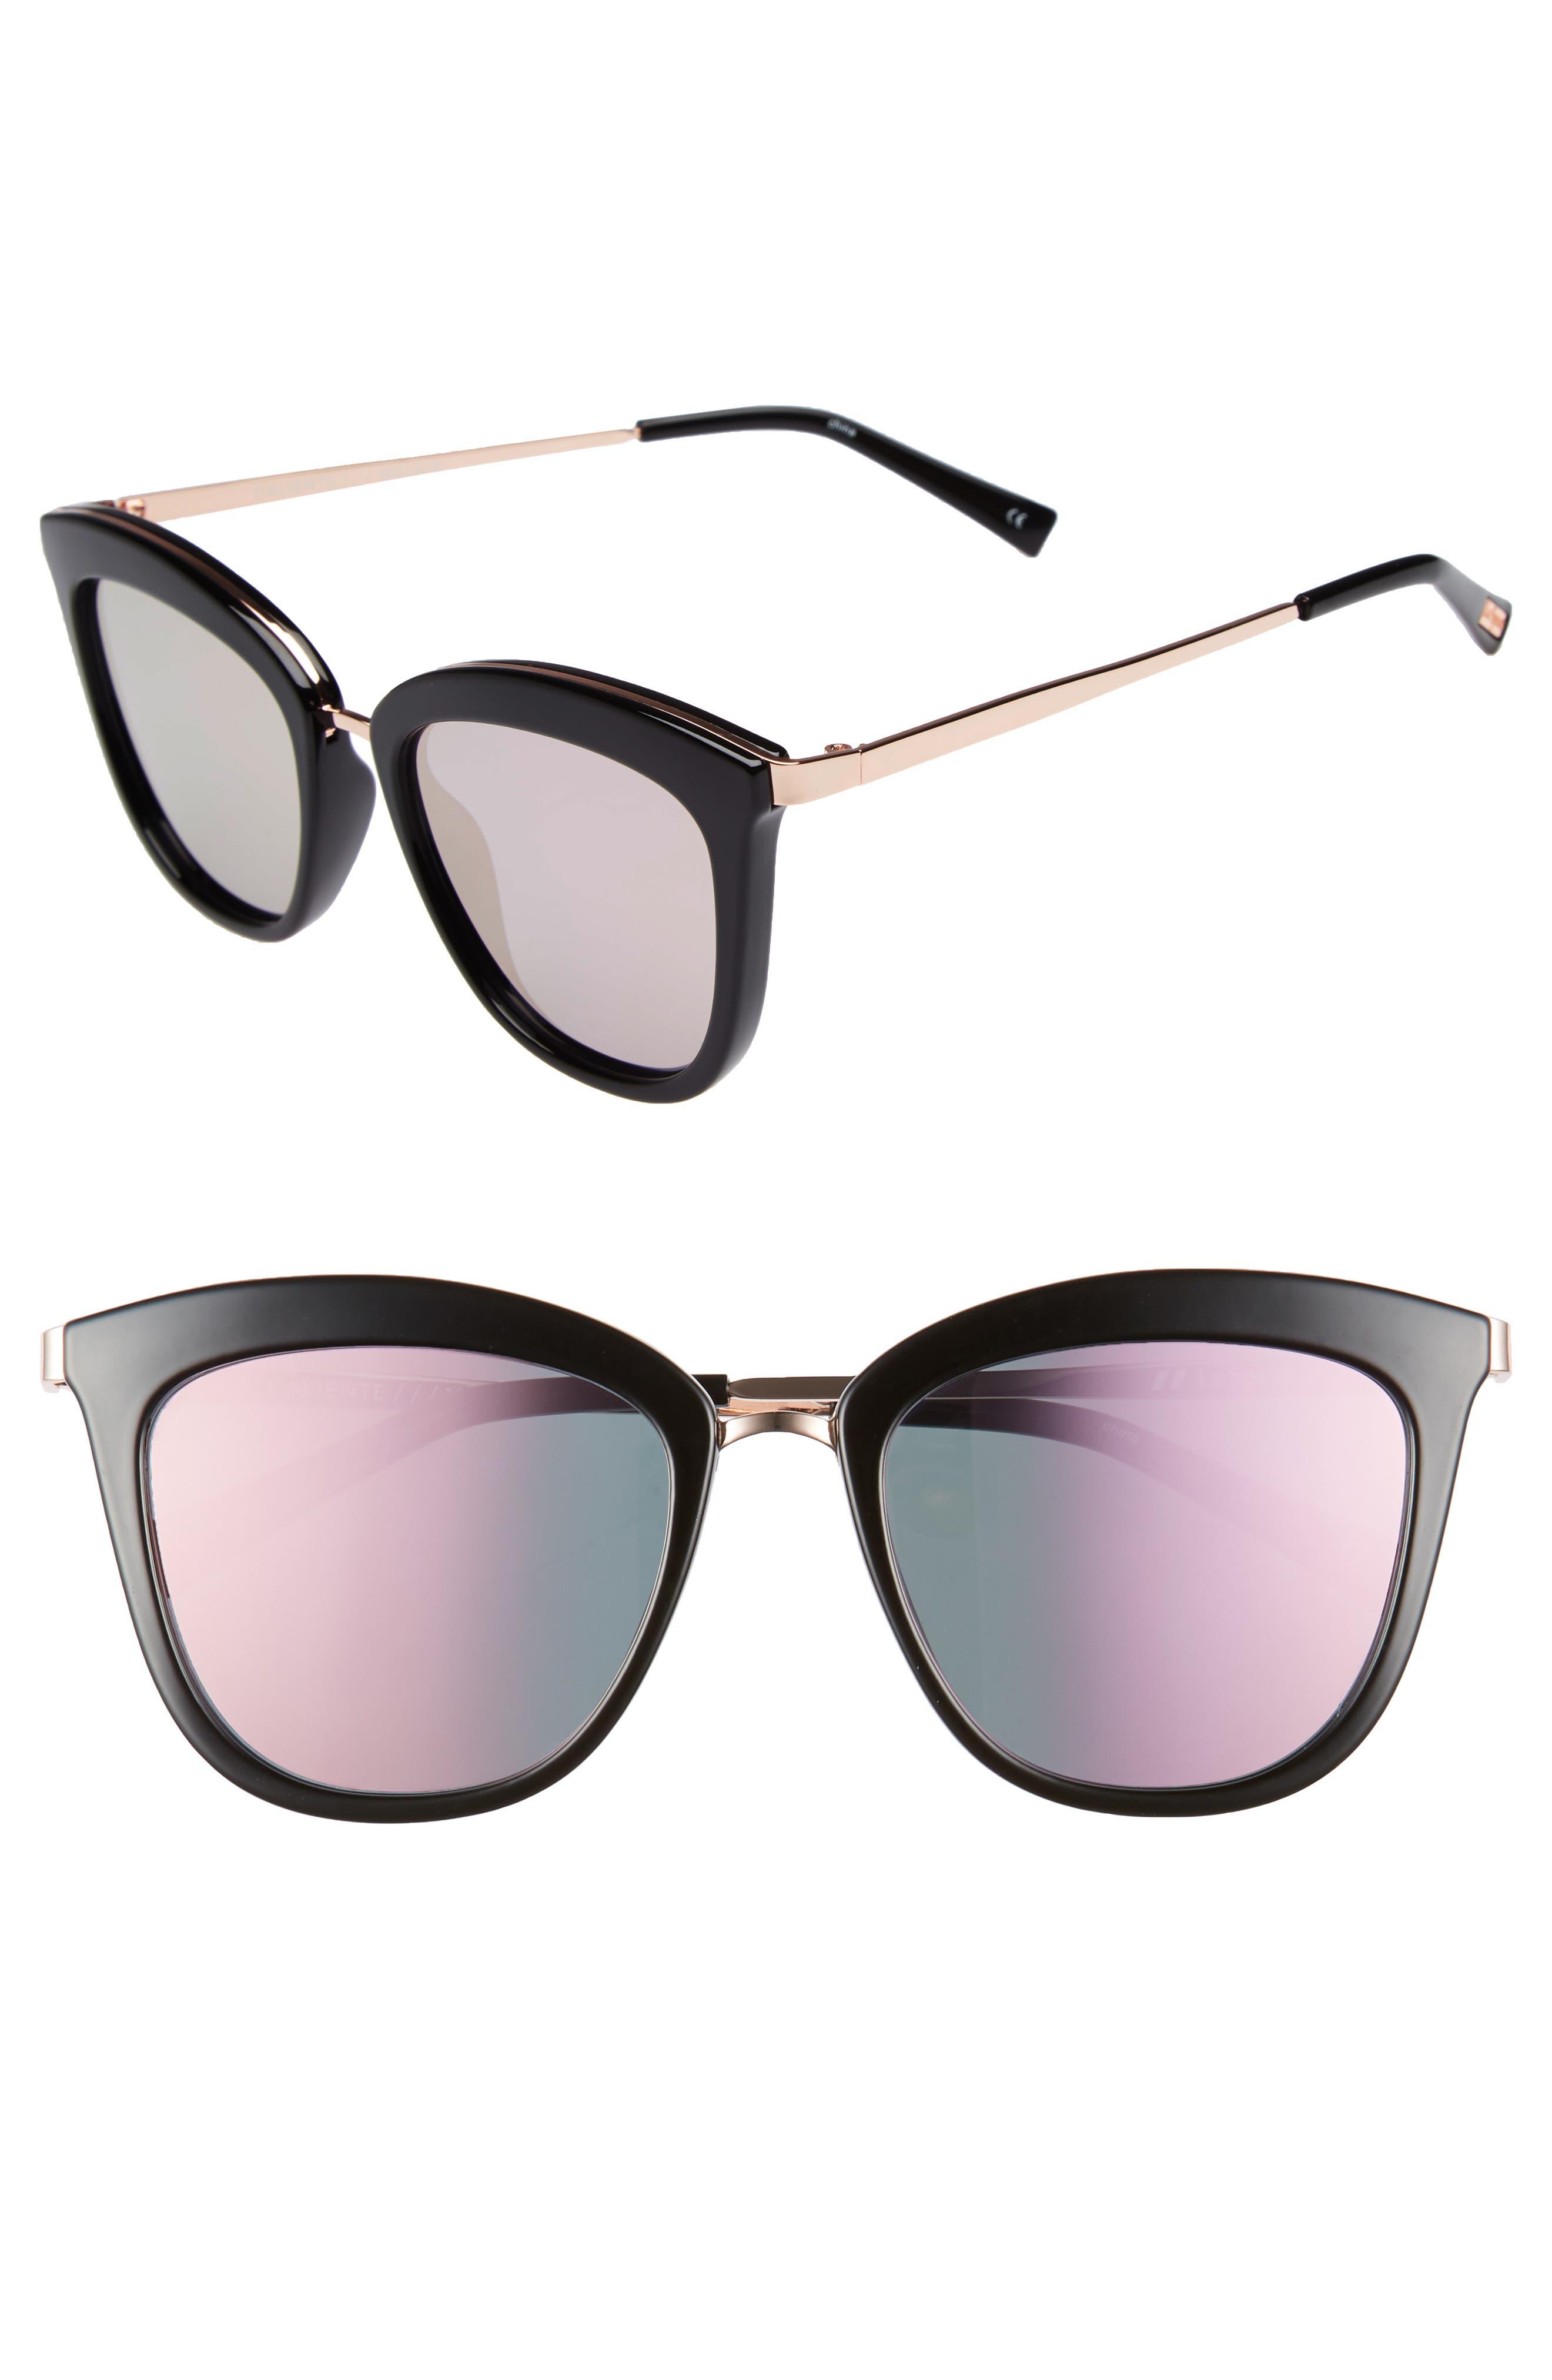 Caliente 53mm Cat Eye Sunglasses,                             Main thumbnail 1, color,                             Black/ Rose Gold